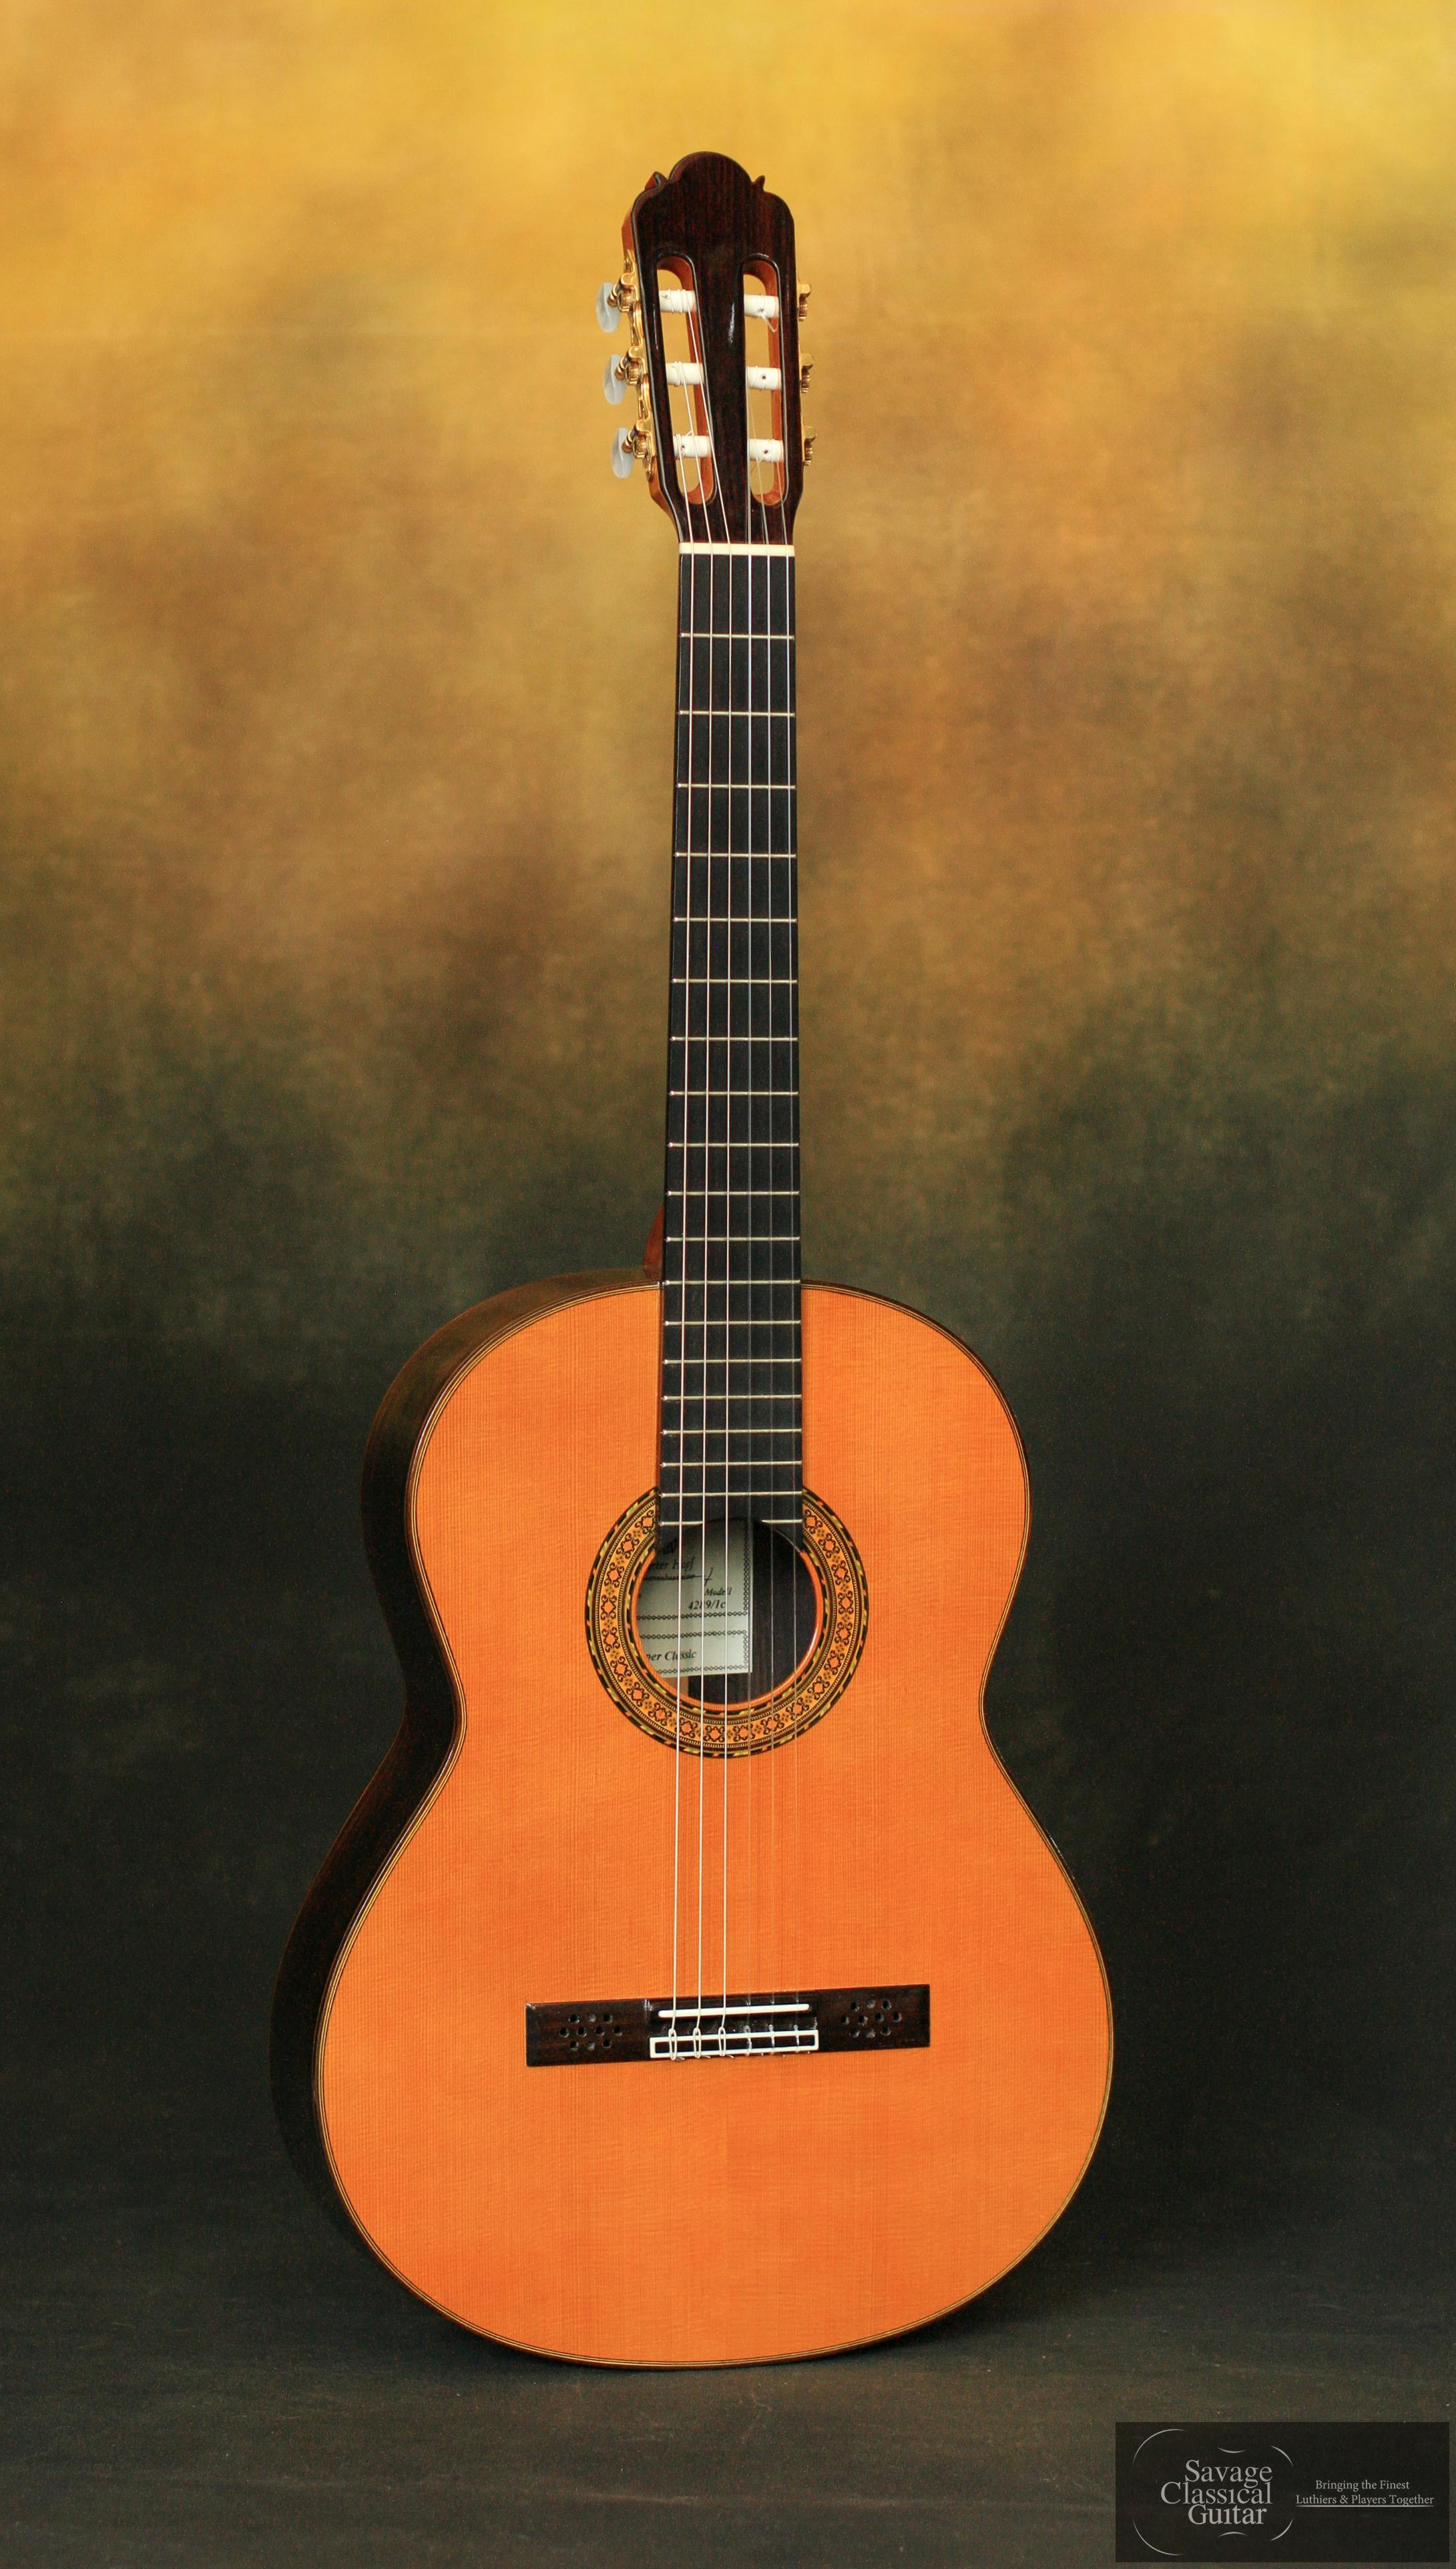 dieter hopf super classic savage classical guitar. Black Bedroom Furniture Sets. Home Design Ideas